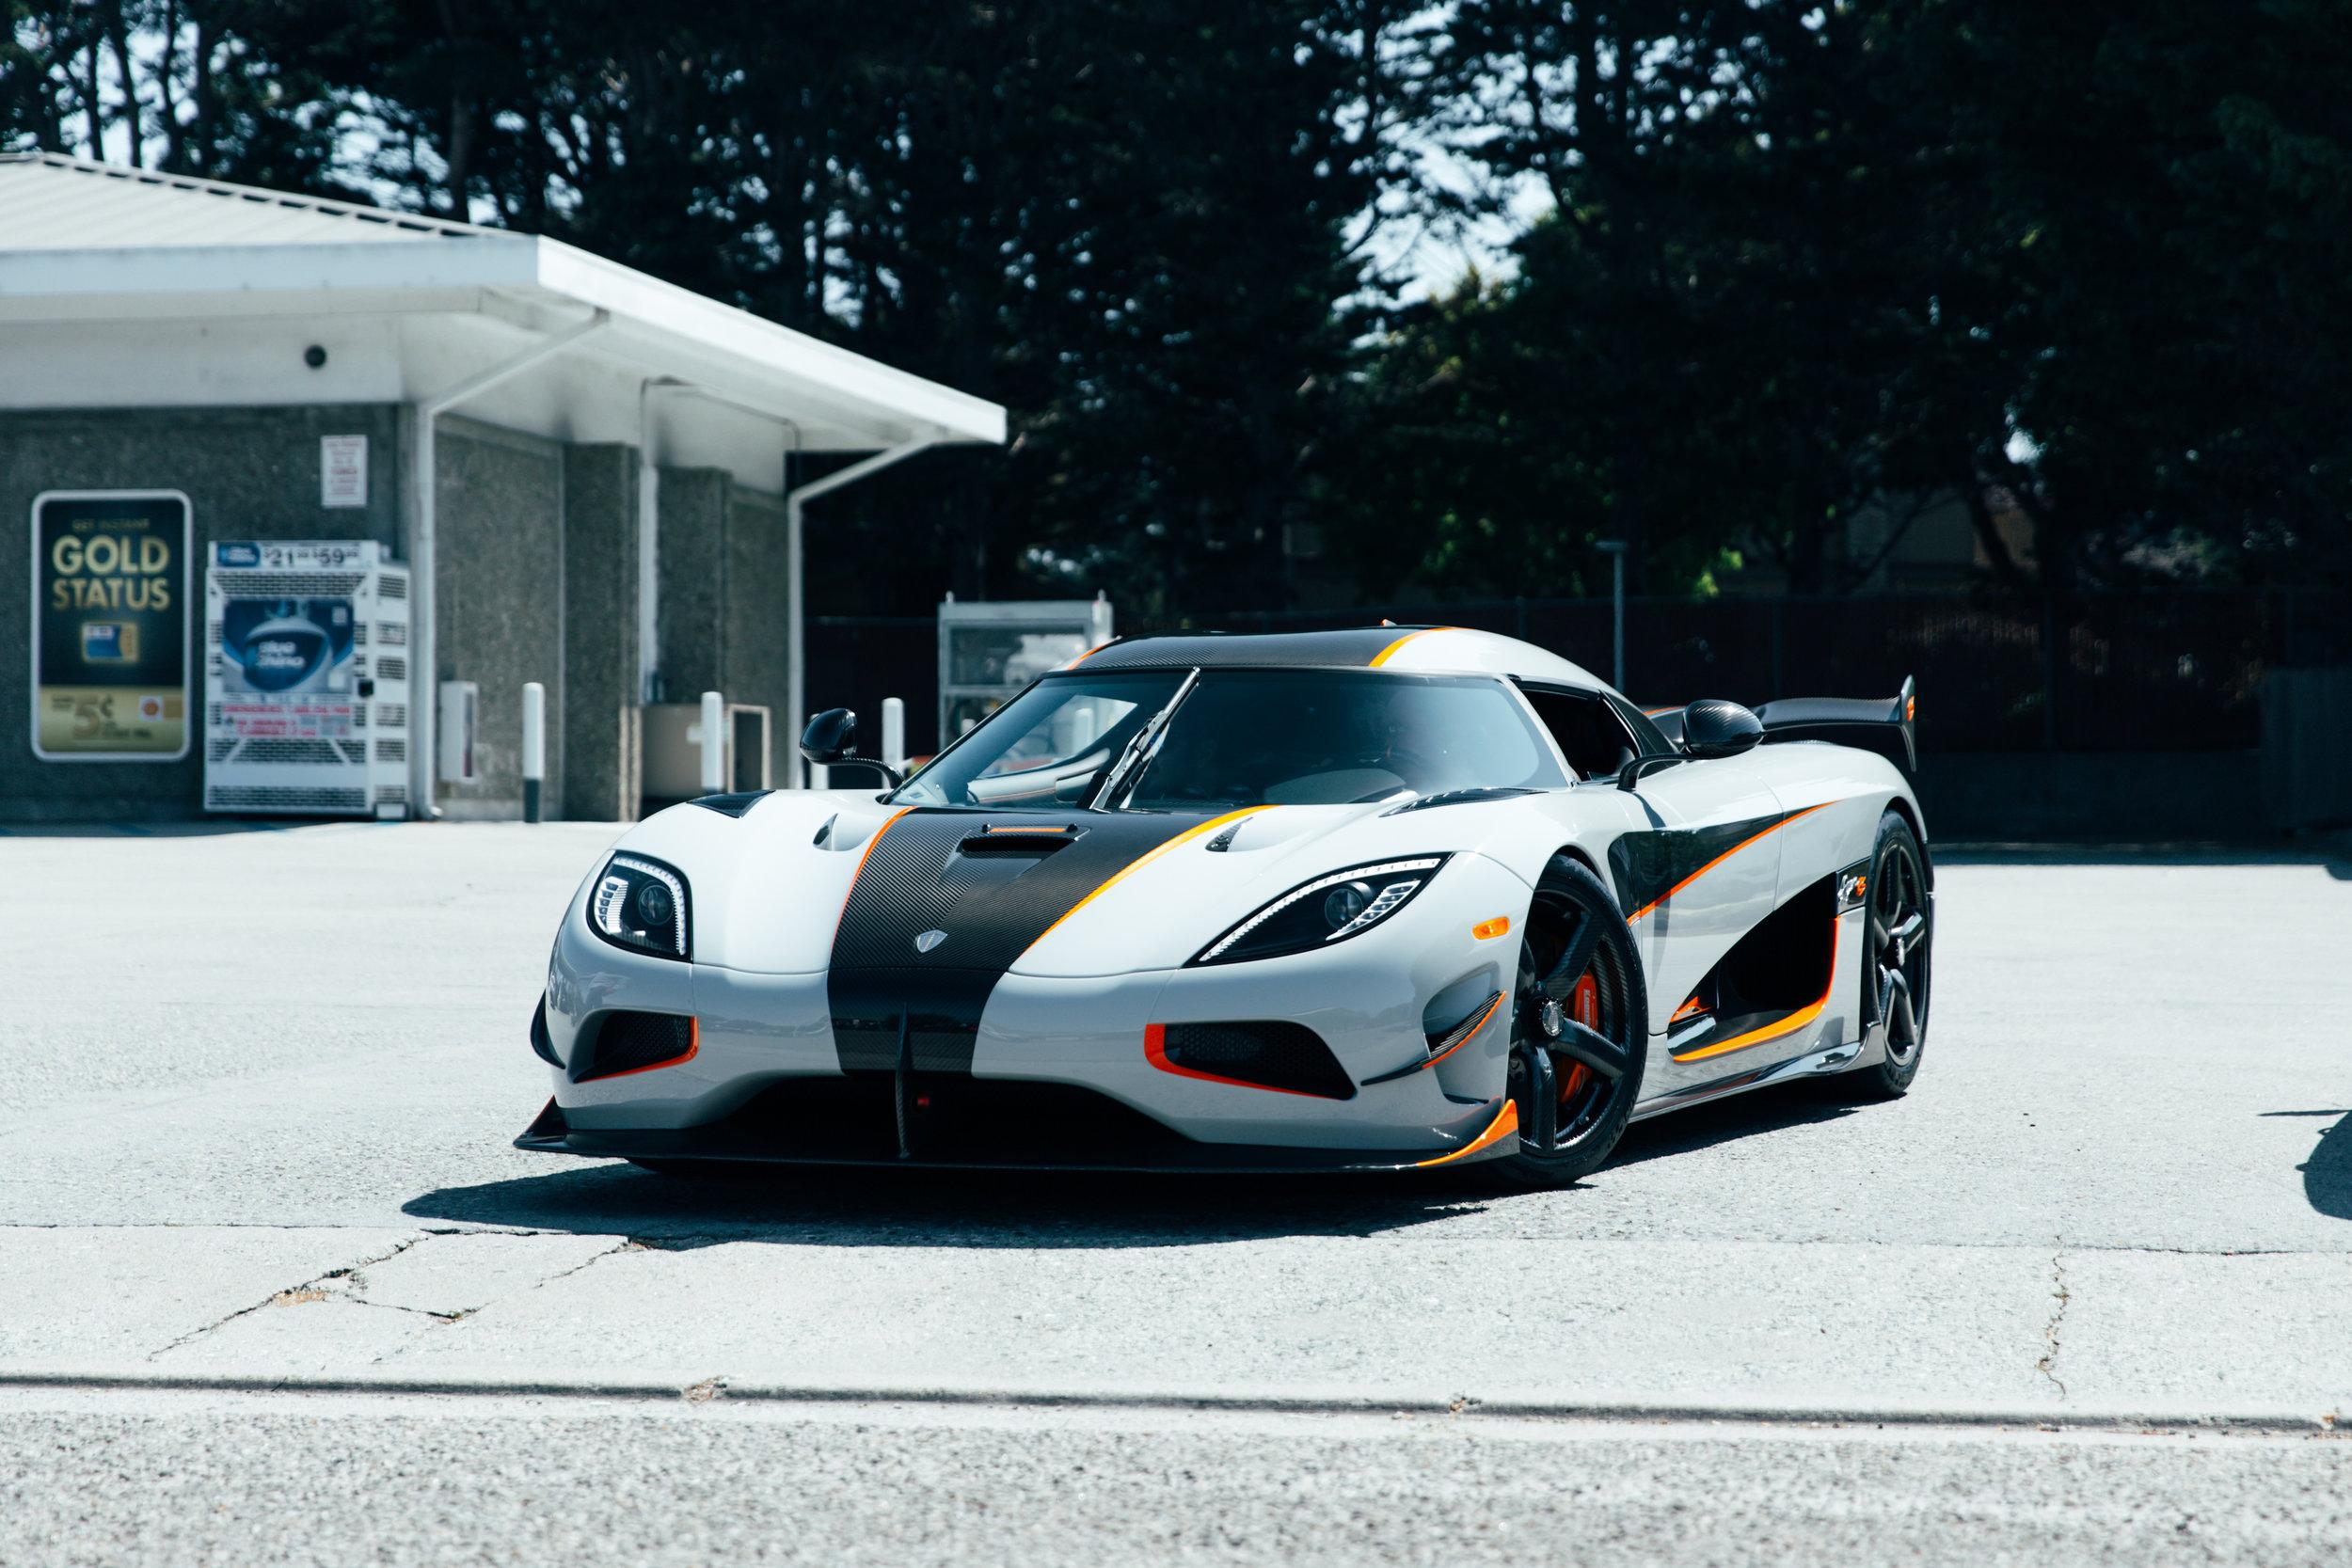 Stay_Driven_Monterey_Car_Week_Koenigsegg-70.jpg